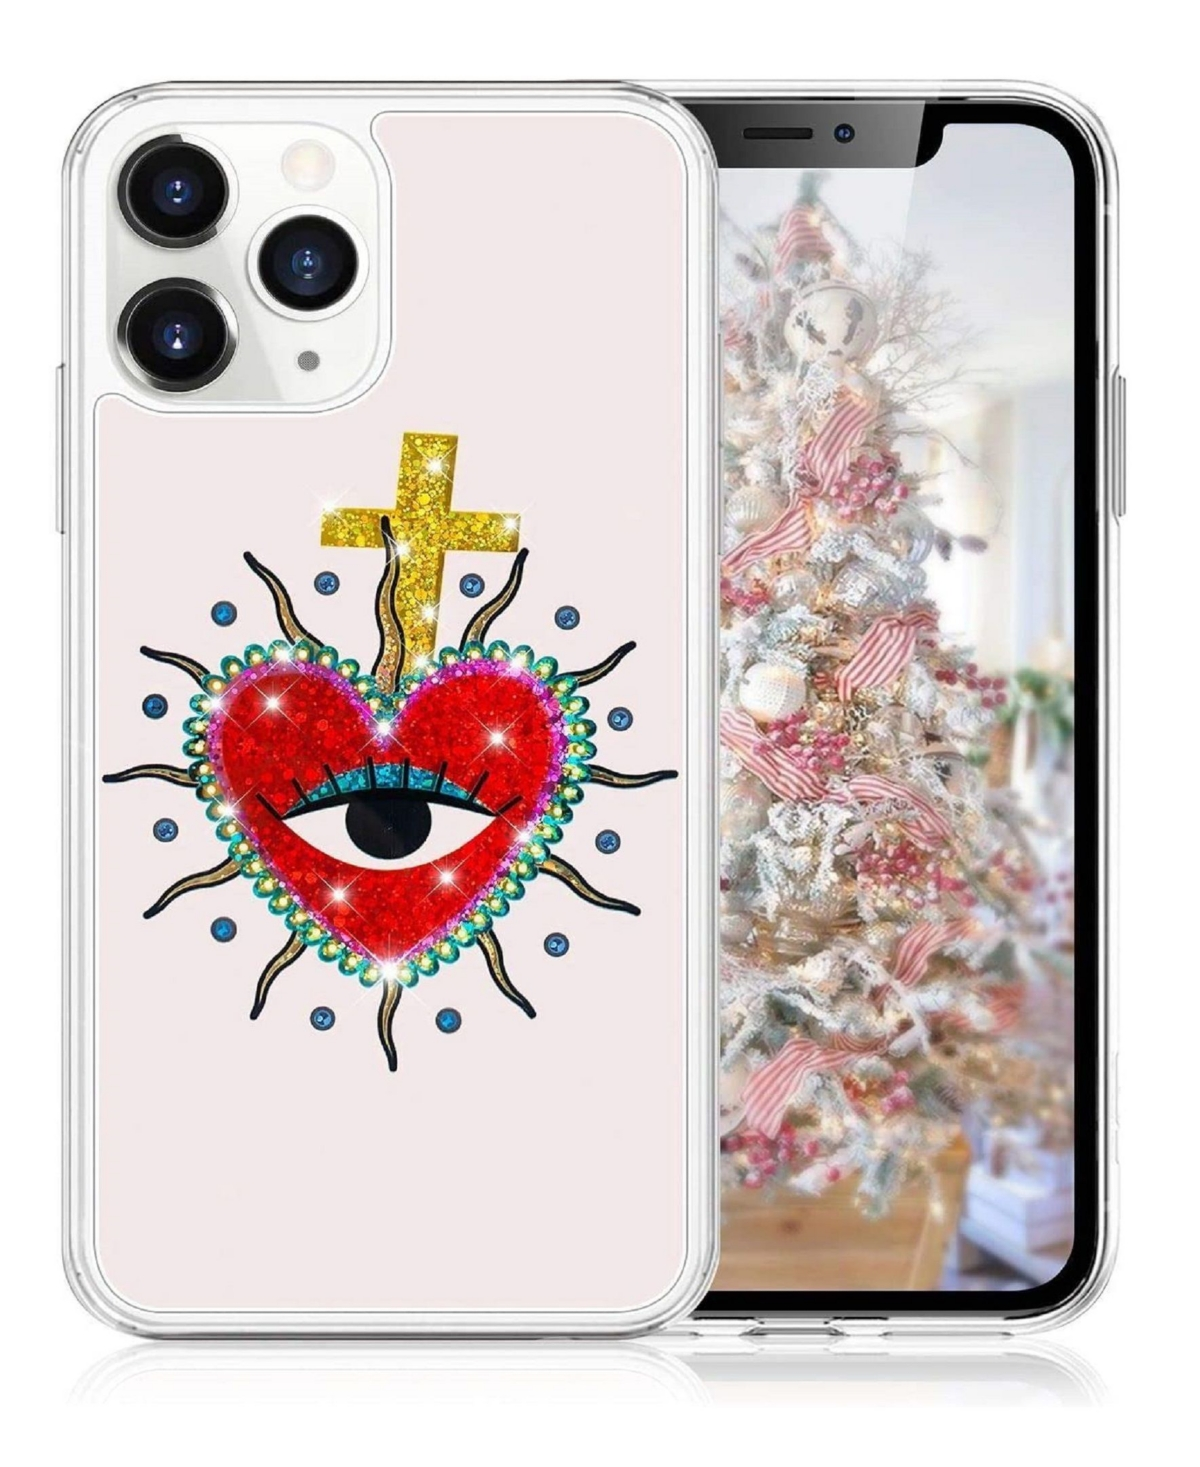 Milanblocks iPhone 11 Pro Heart Glitter Phone Case